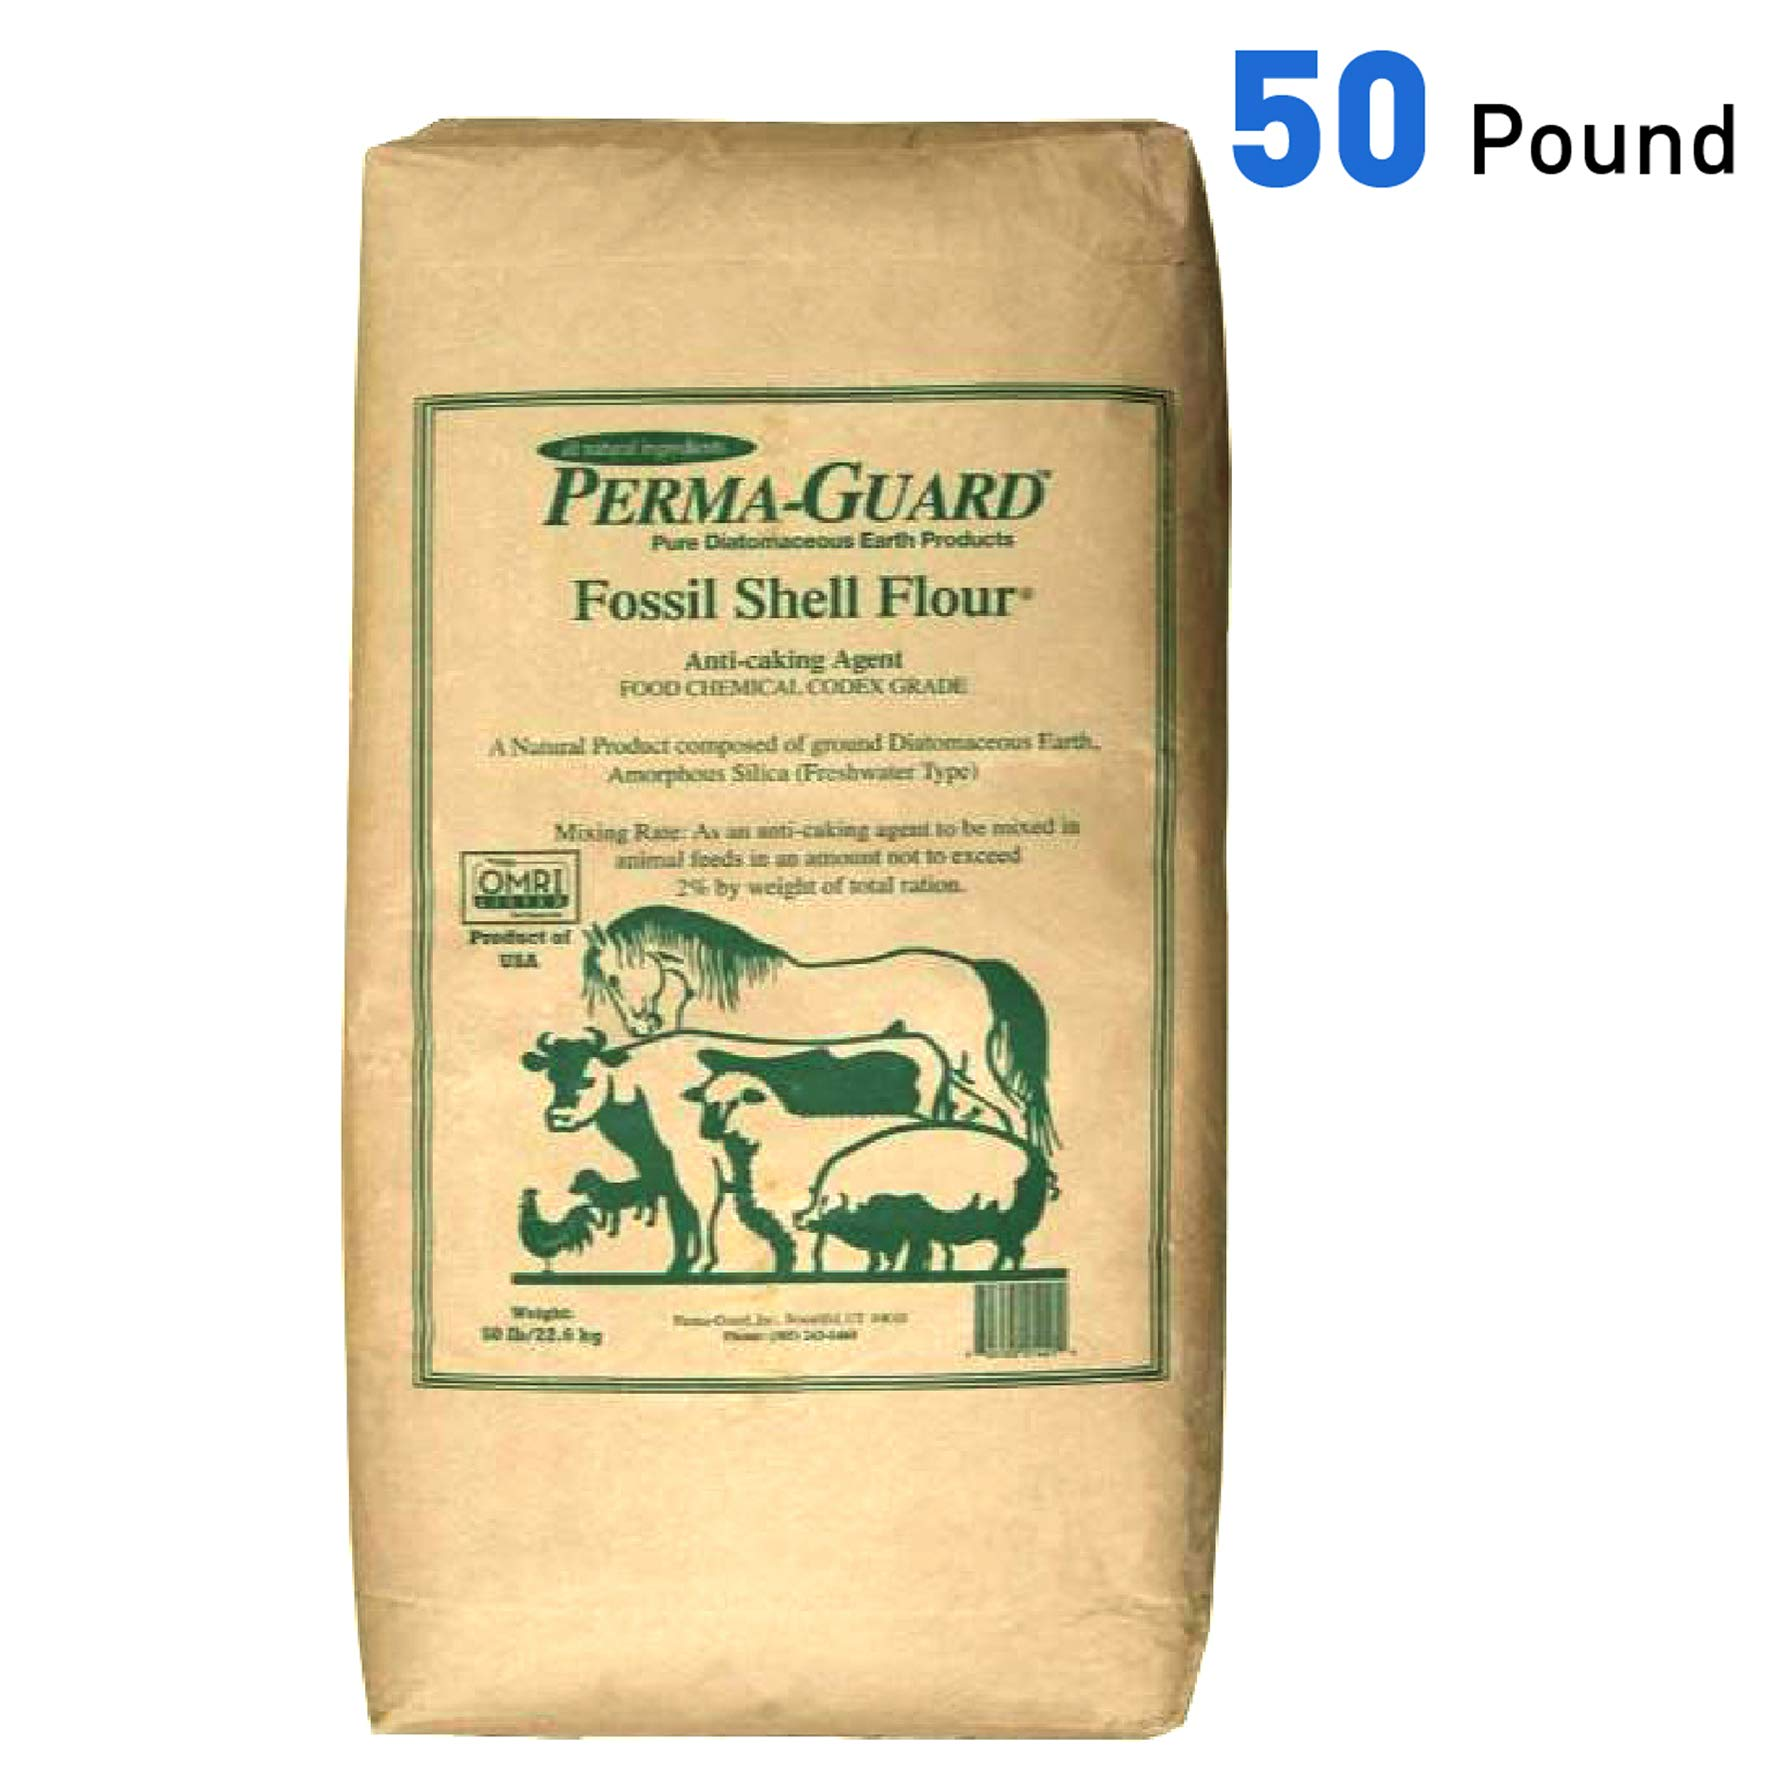 Perma Guard EGP-DE-50C erma Guard Diatomaceous Earth-DE Food Grade, 50 lb, White by Perma-Guard